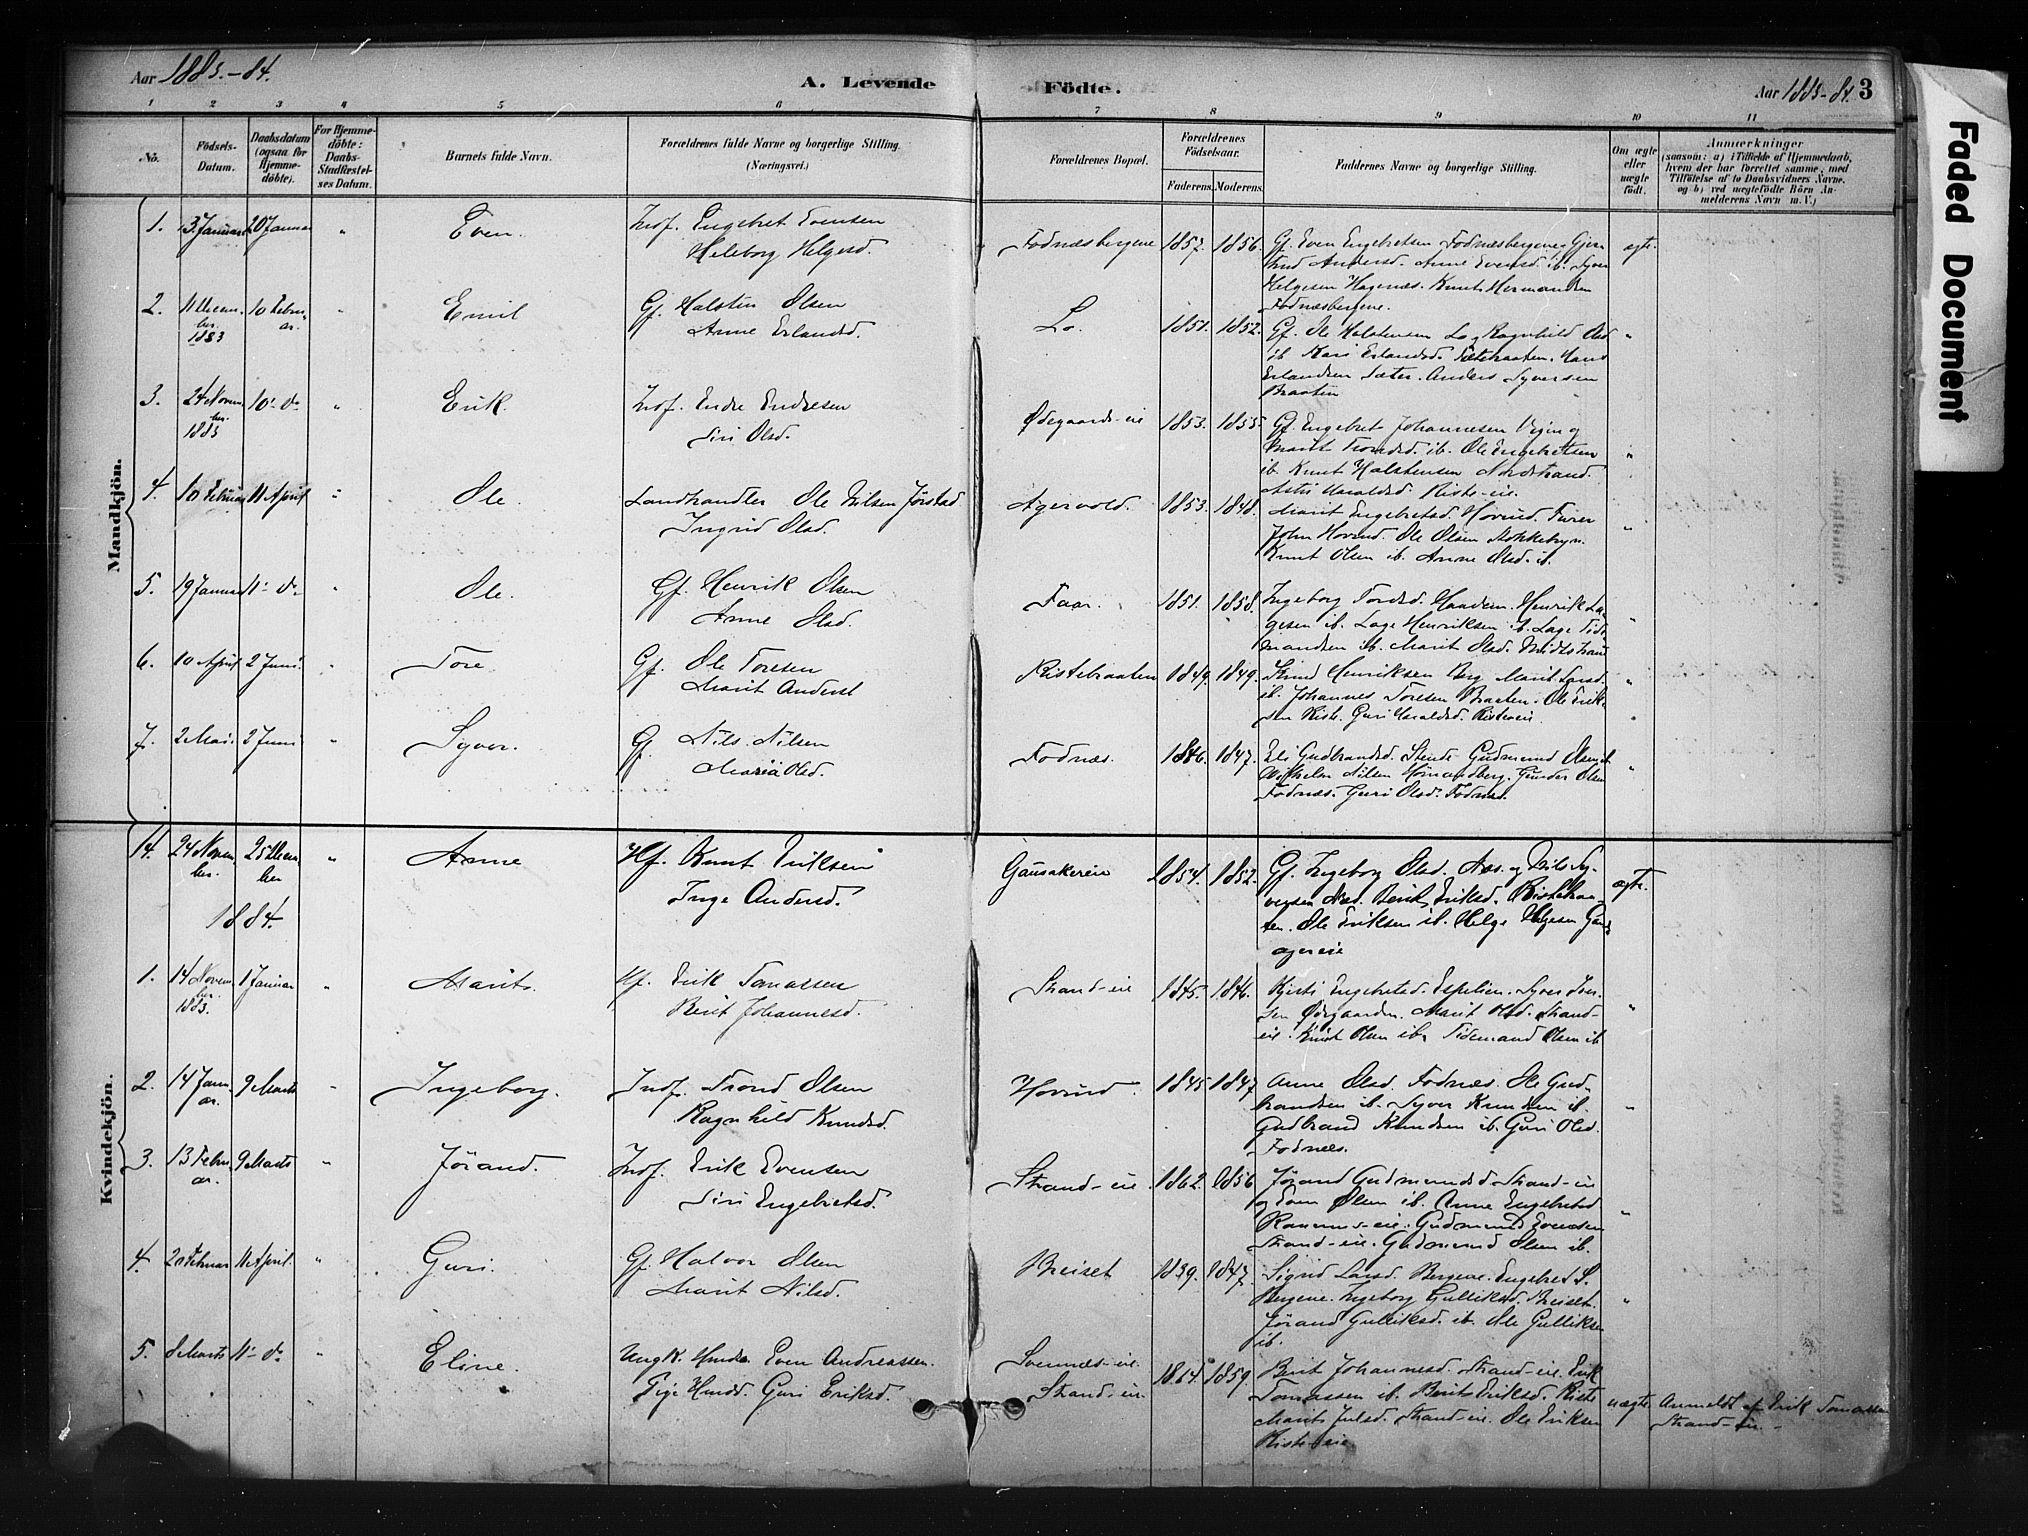 SAH, Nord-Aurdal prestekontor, Ministerialbok nr. 10, 1883-1896, s. 3